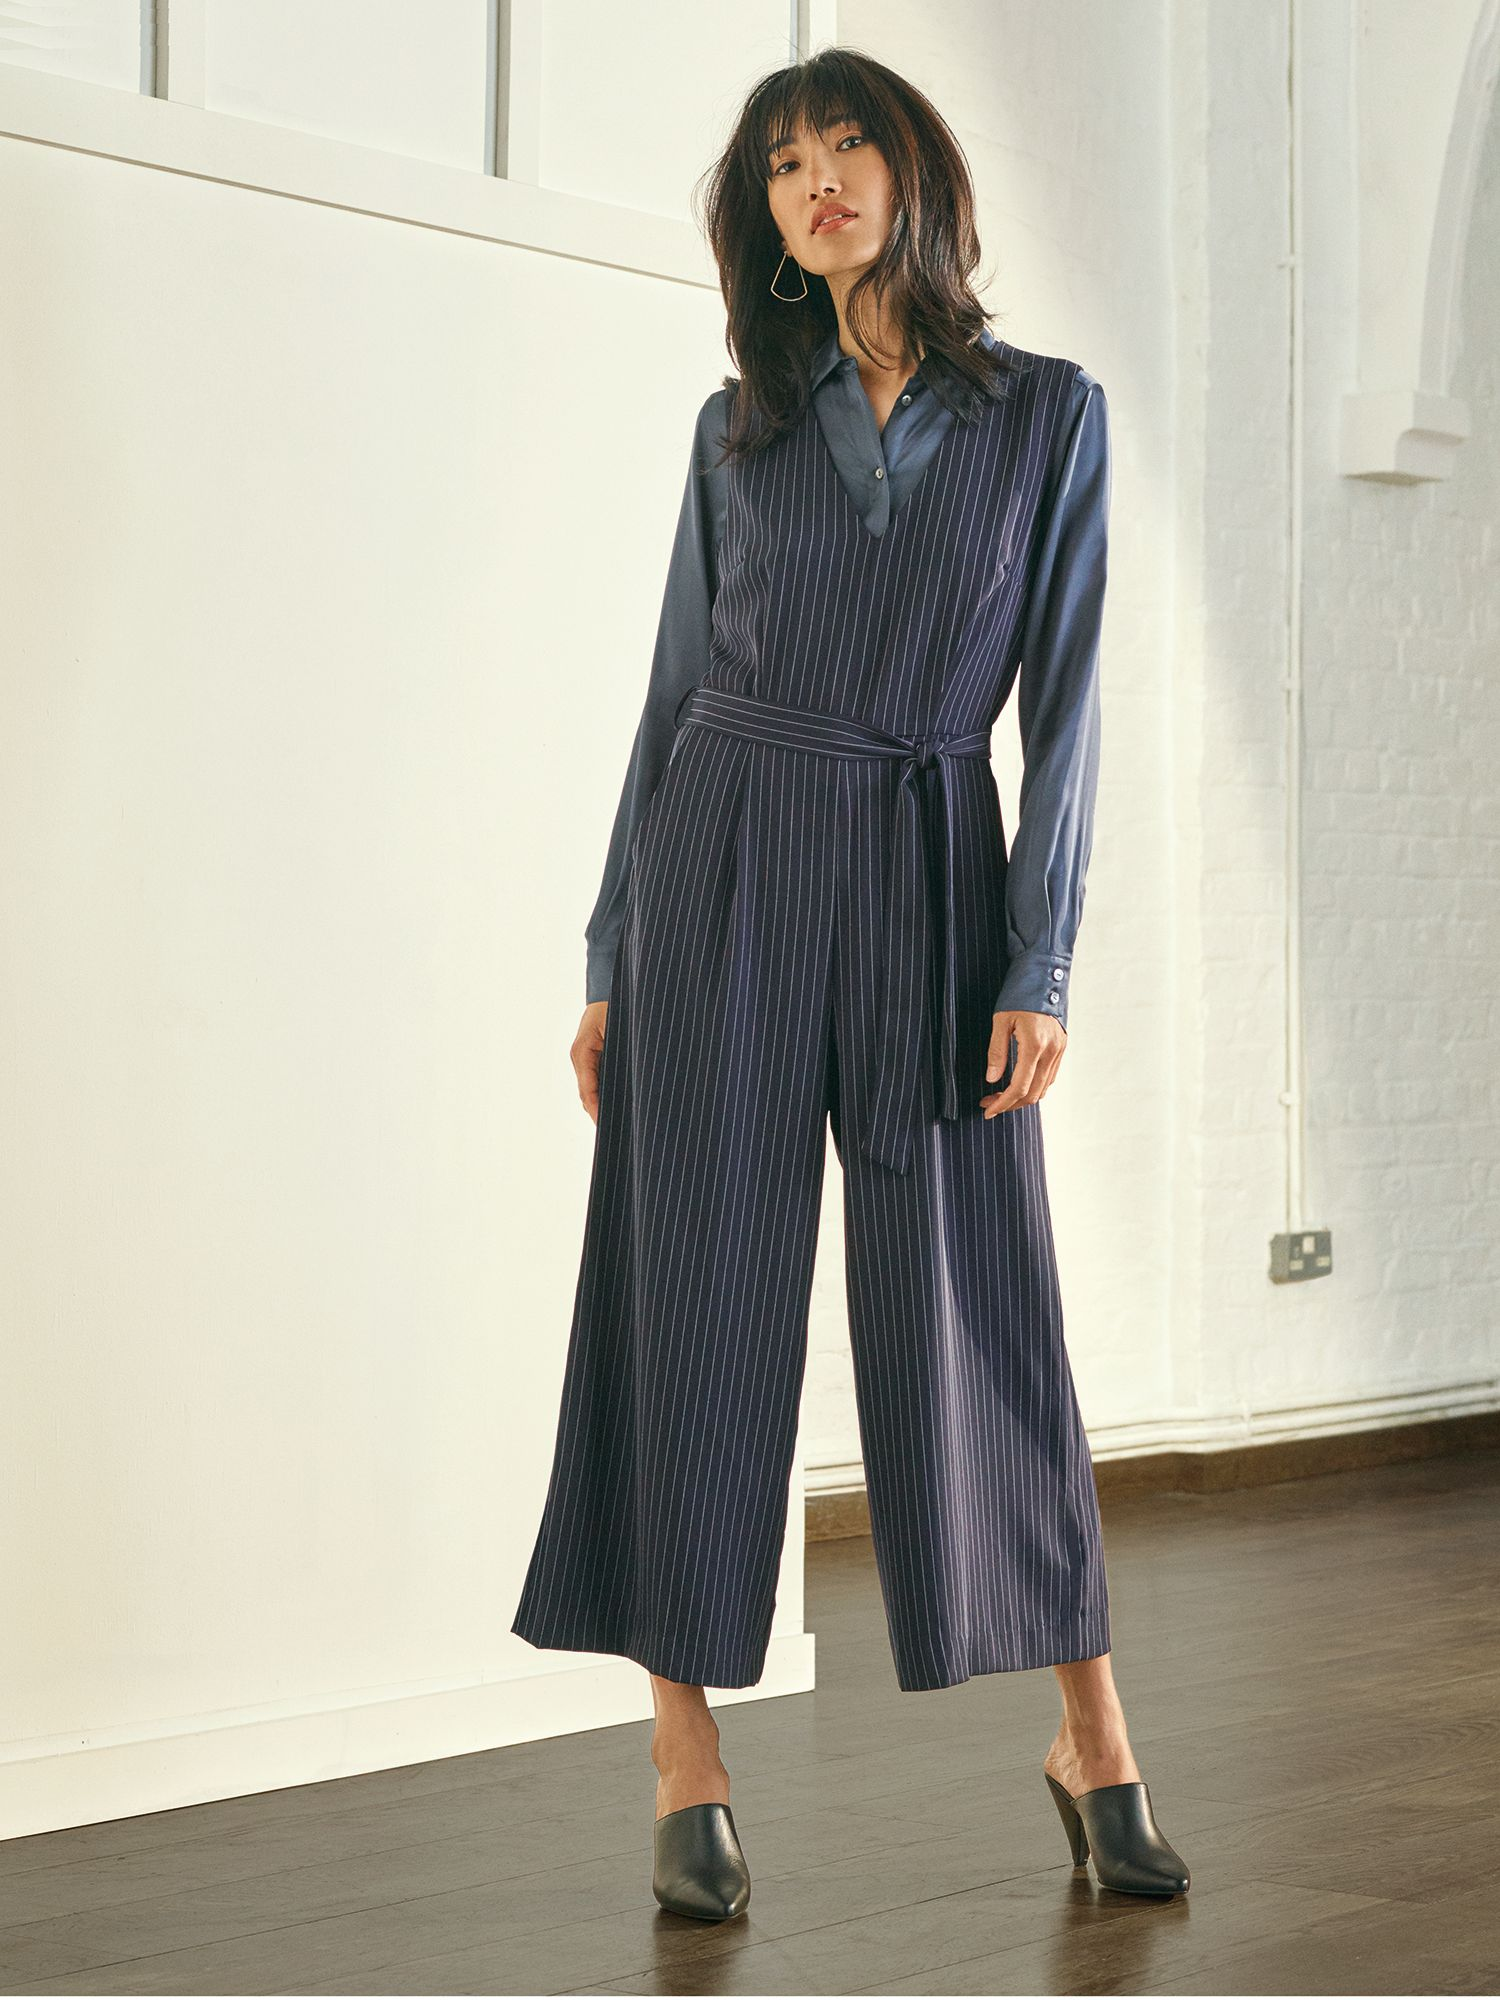 A model wearing a jumpsuit by John Lewis